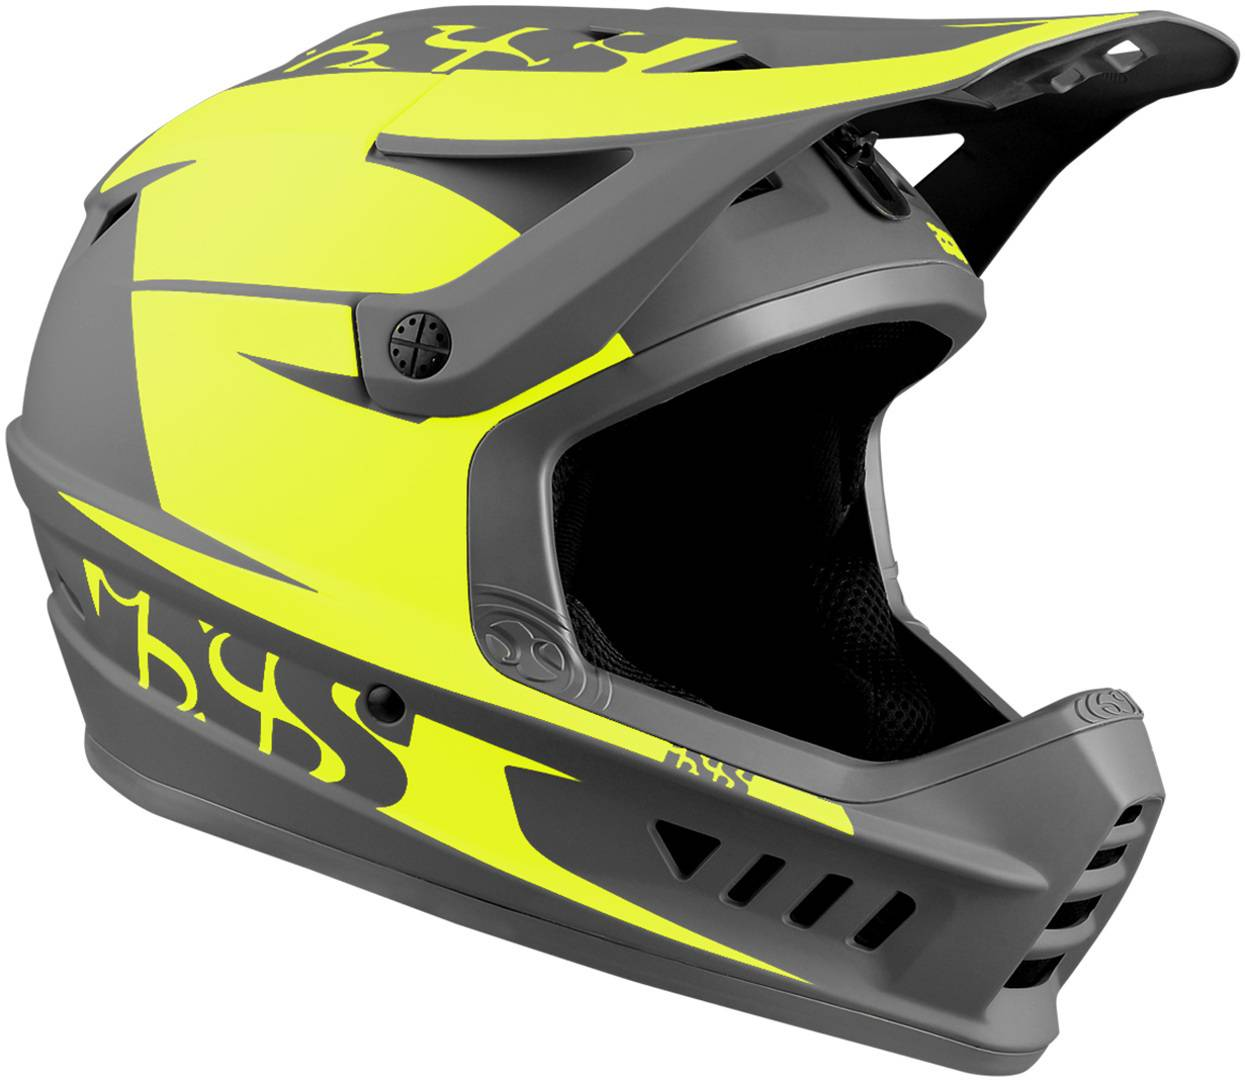 IXS XACT Evo Downhill Helmet  - Size: Small